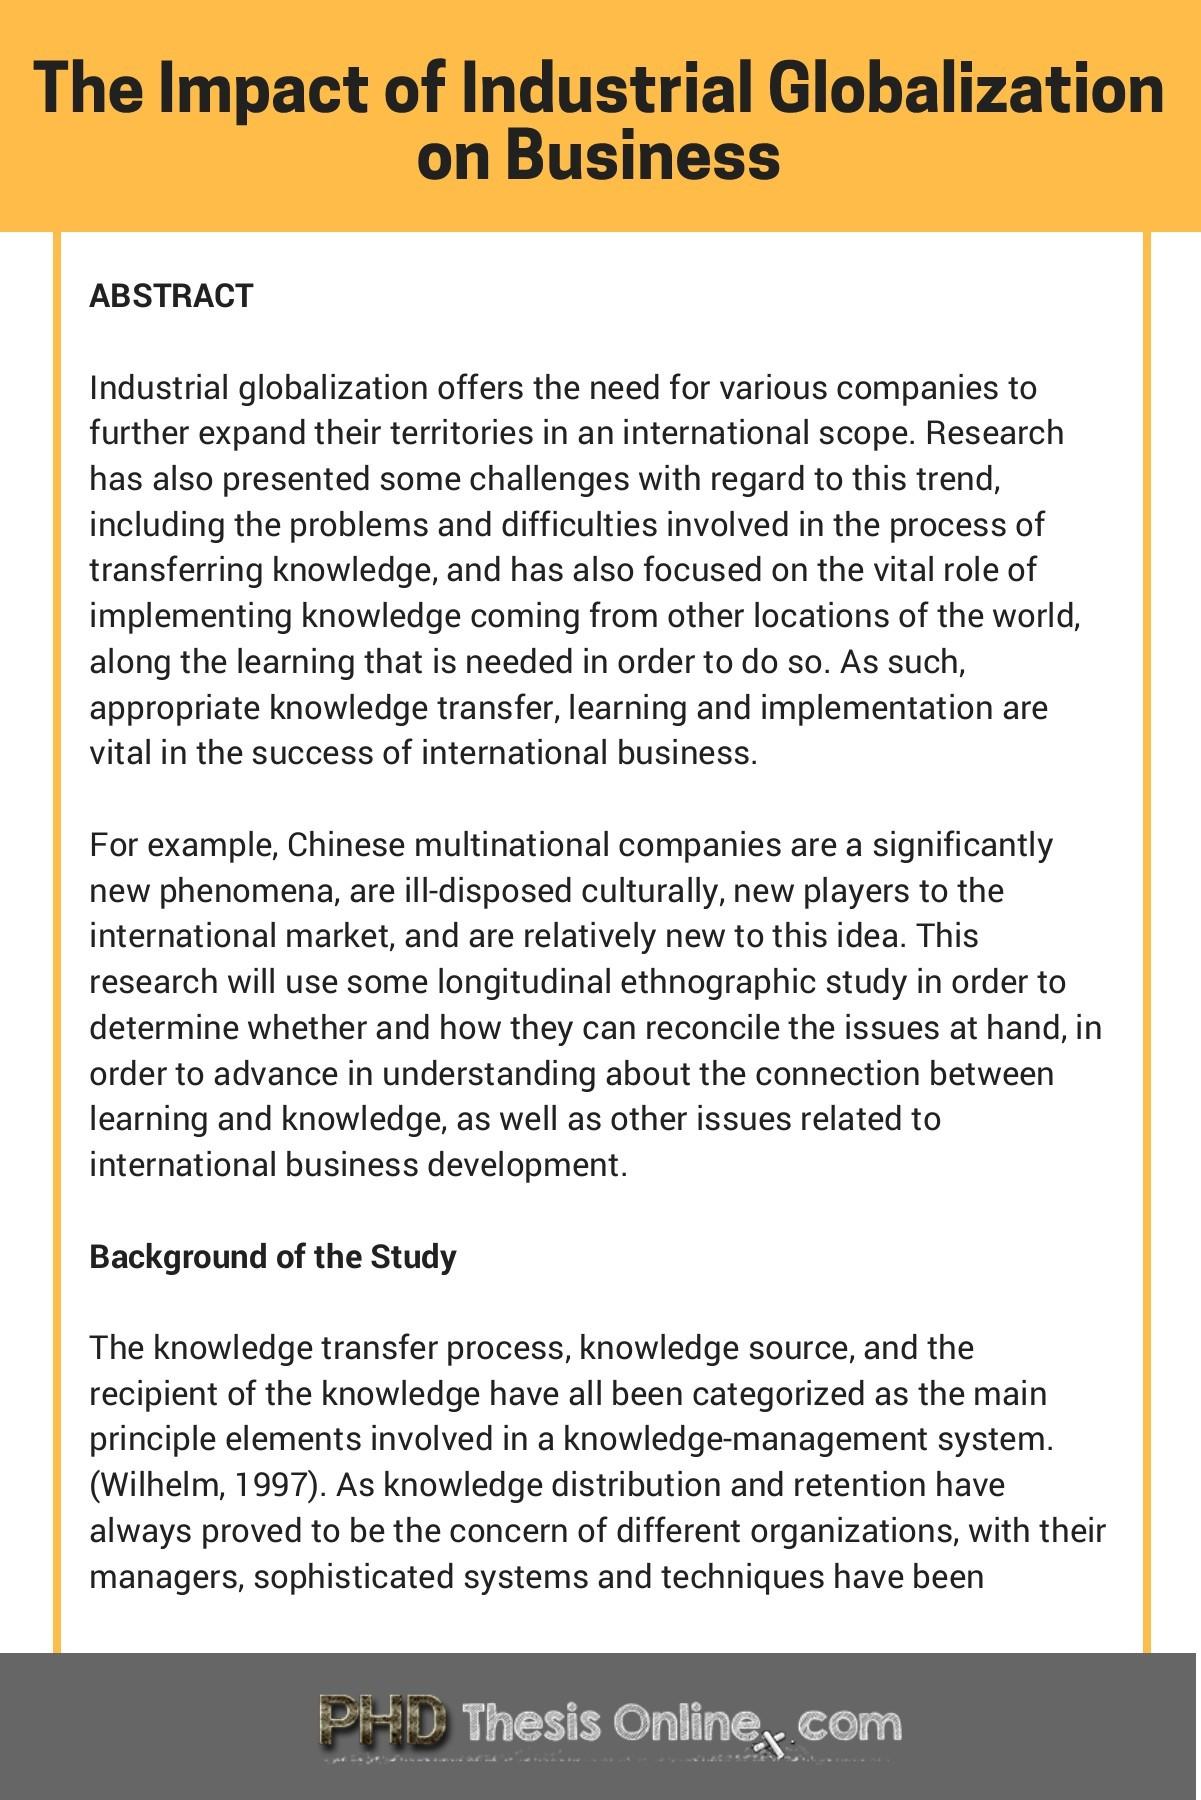 DBA Research Proposal Sample   PhD Thesis Online   Flip PDF Online ...